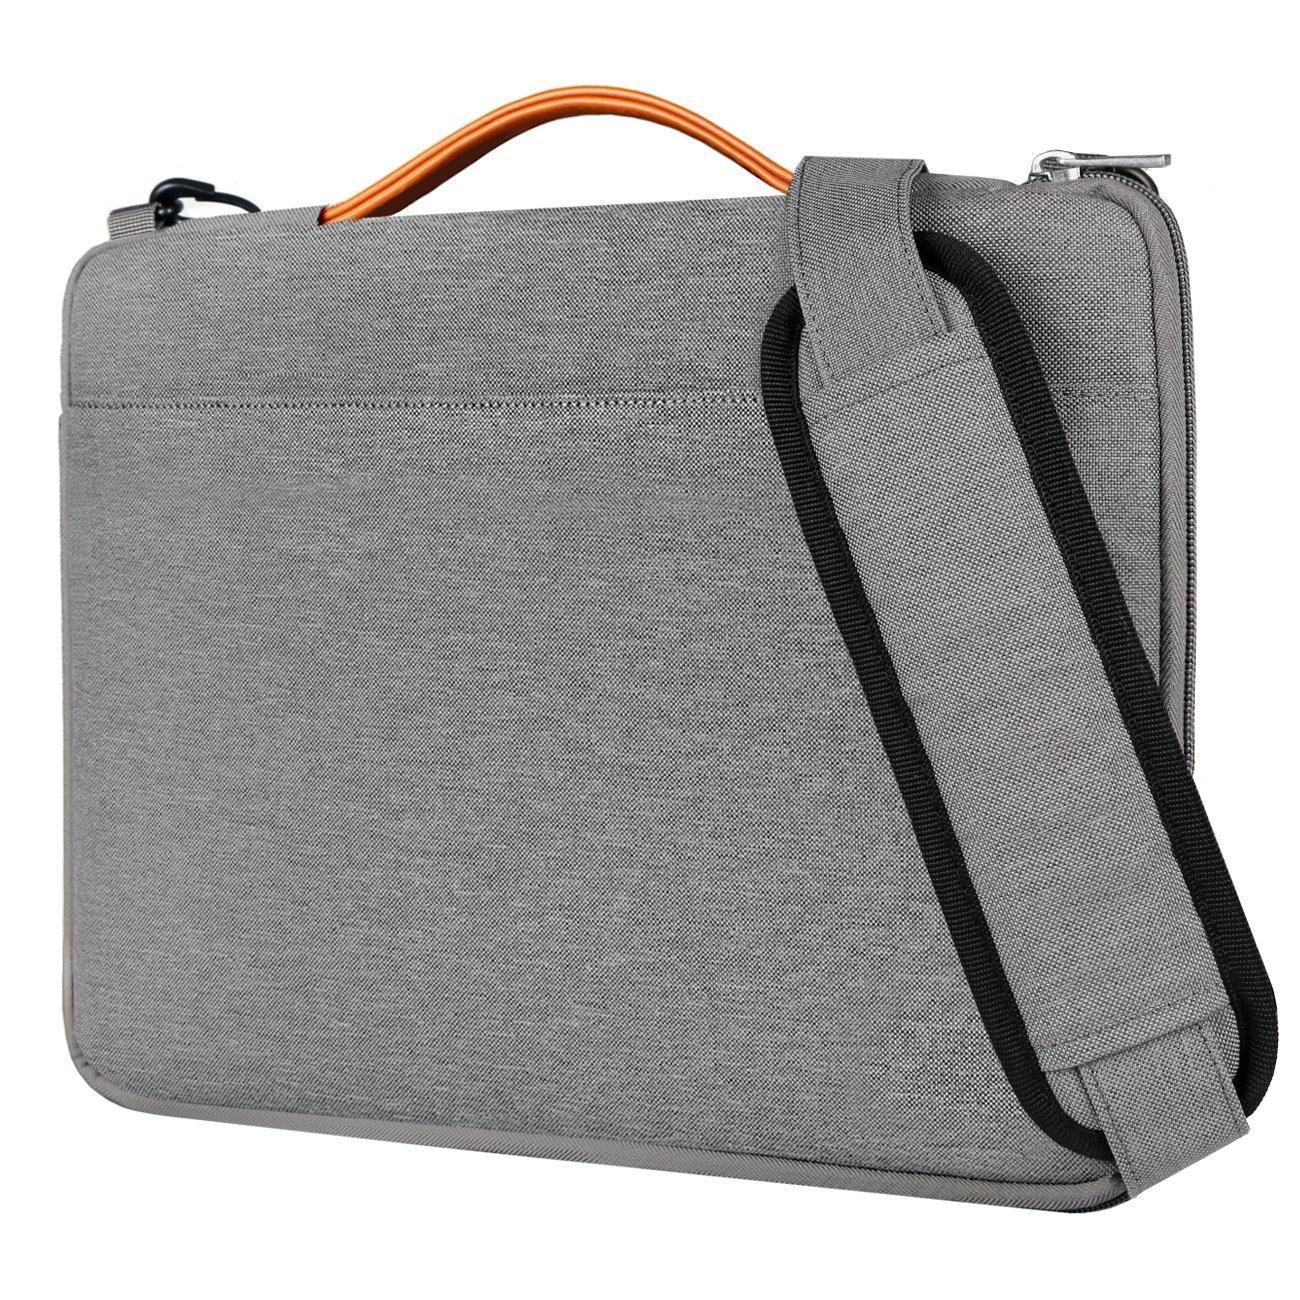 Inateck Bolso Bandolera para Ordenador Portátil de Pulgadas Laptop Sleeve Resistente a